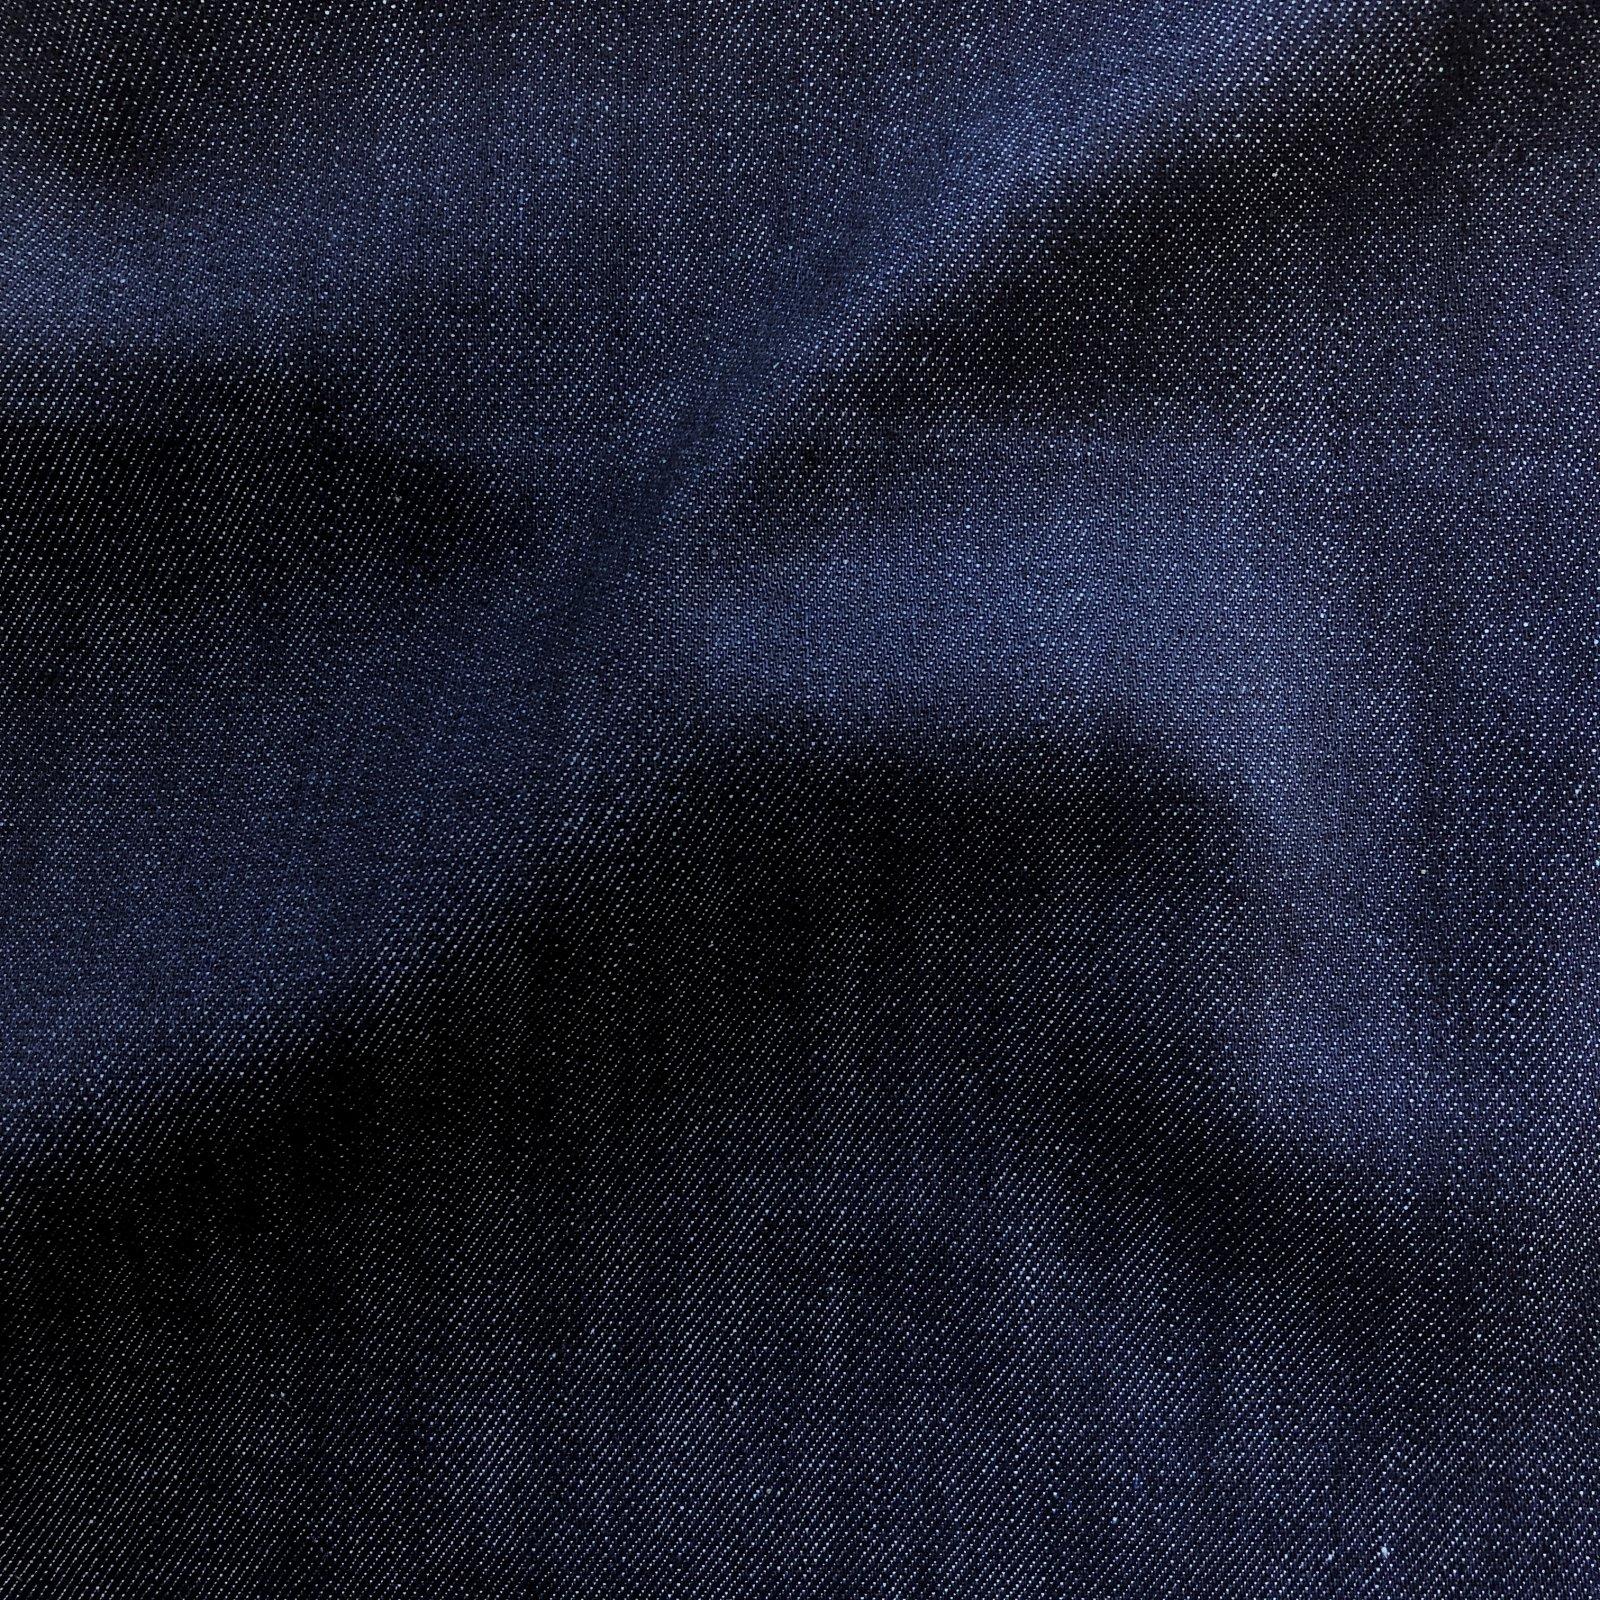 Cone Mills - 11oz Stretch Denim - Indigo